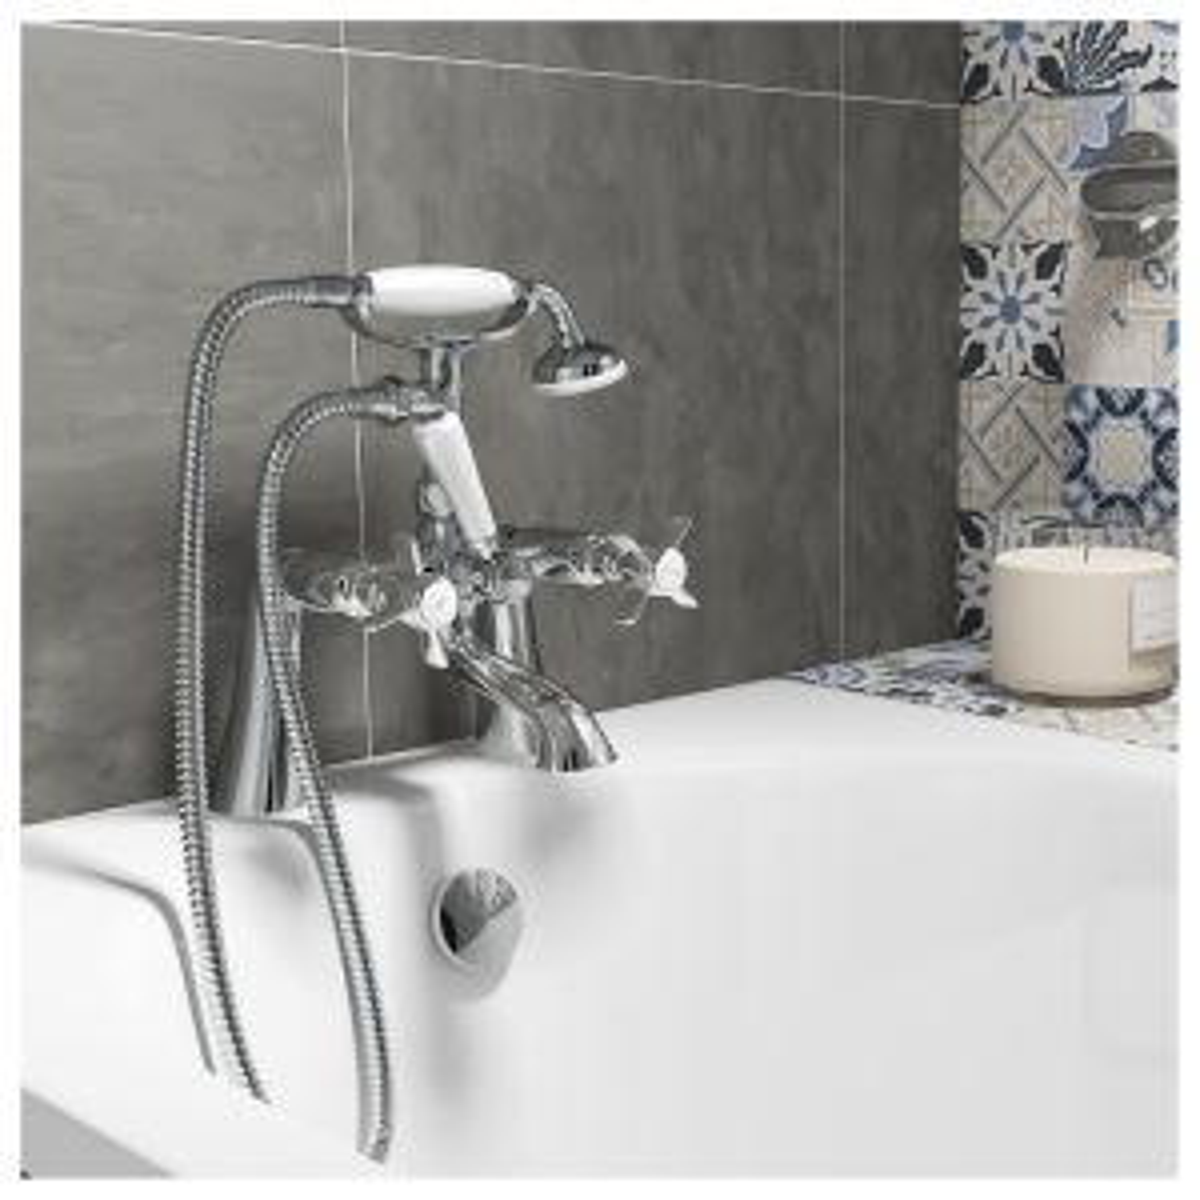 Zenith Time Cranked Bath Shower Mixer Tap Lifestyle